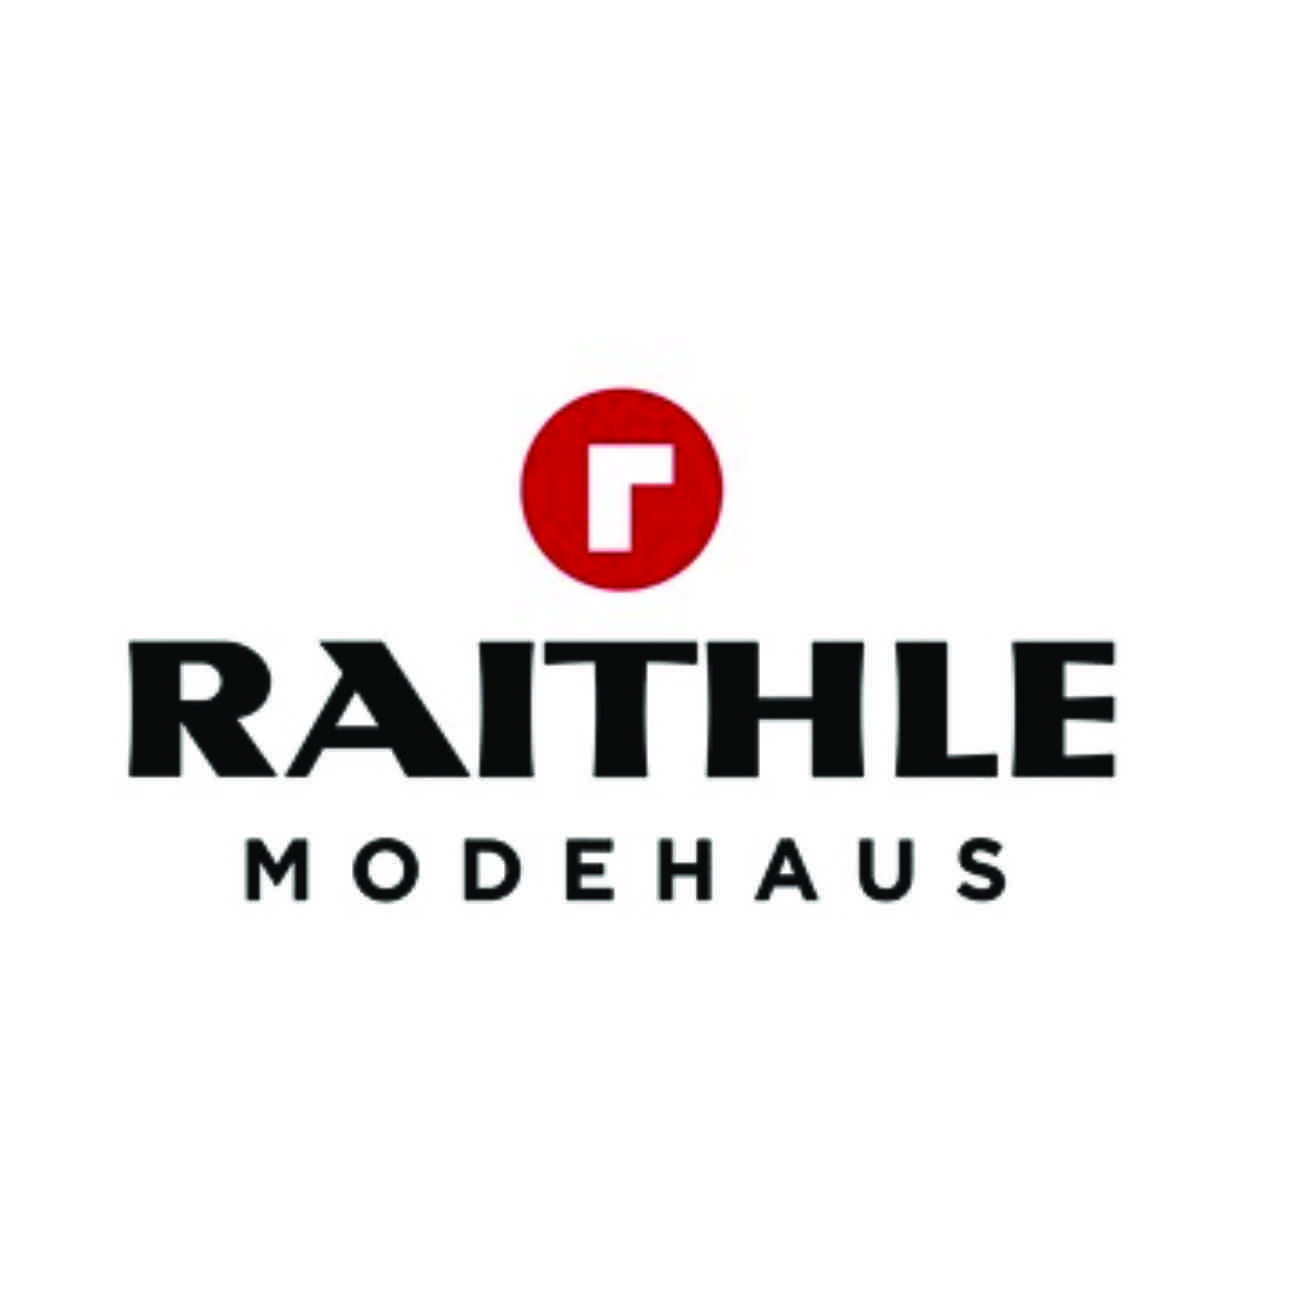 Raithle Modehaus